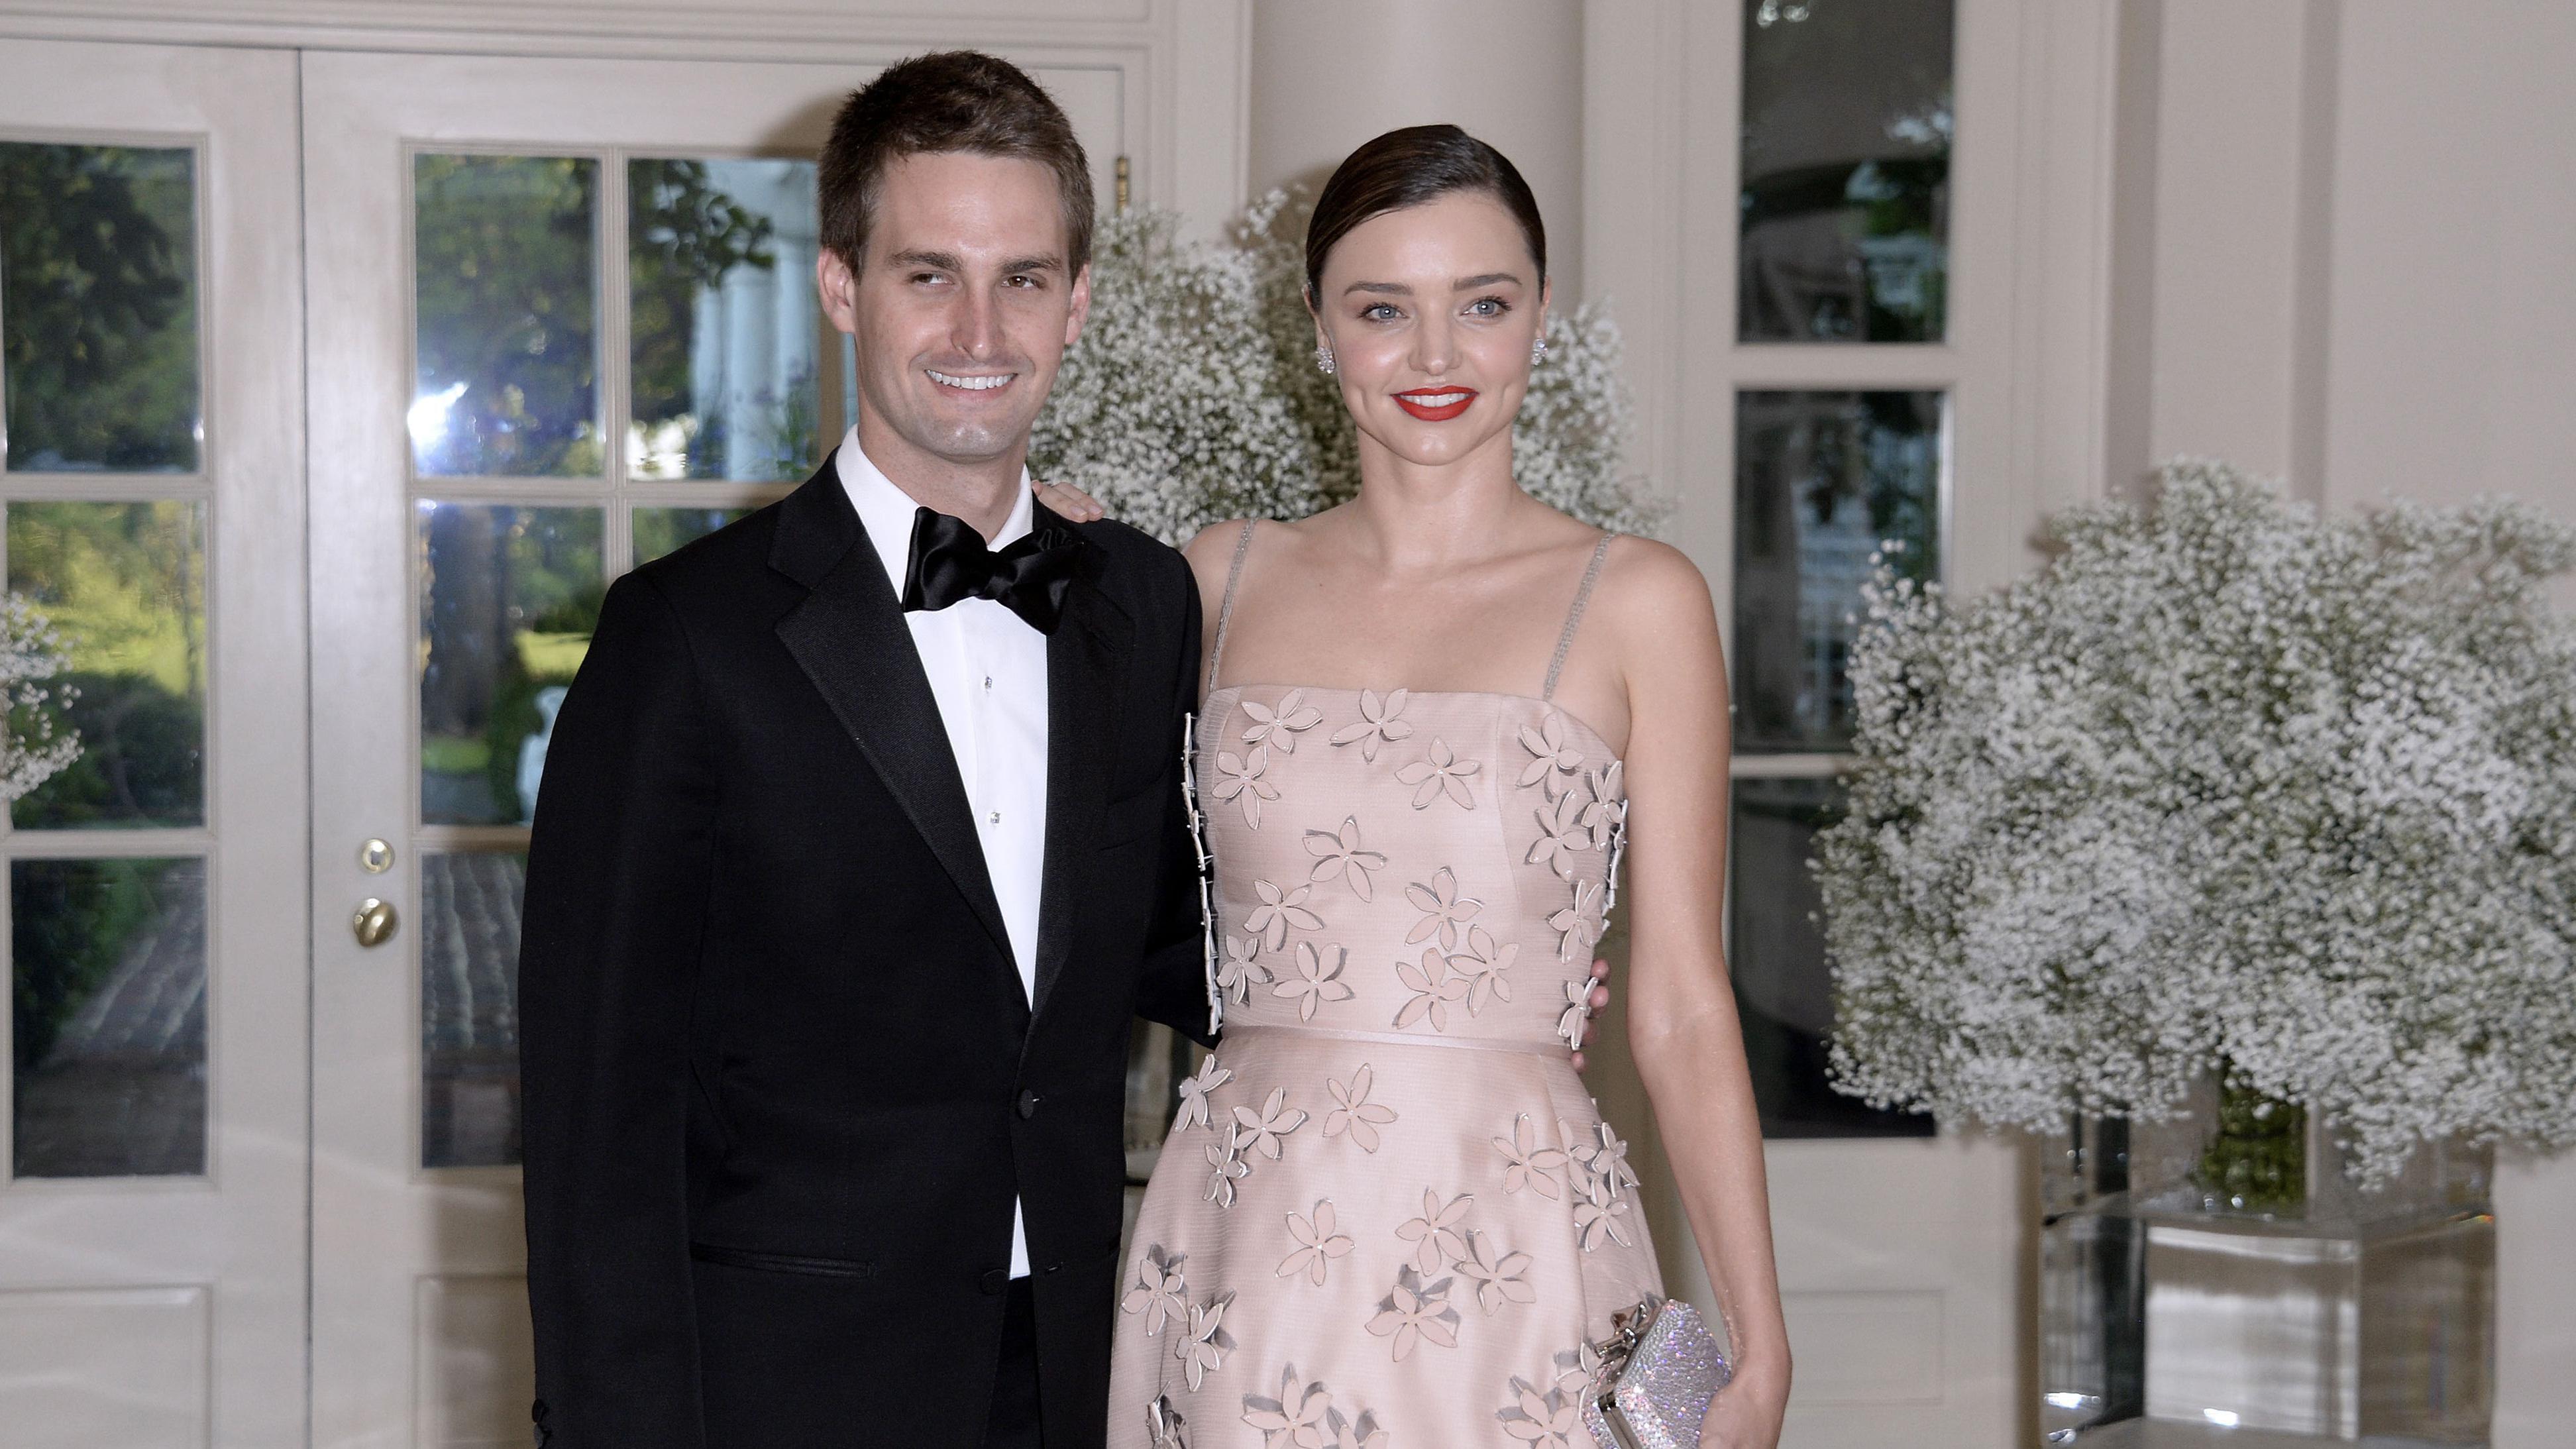 Miranda Kerr S Husband Evan Spiegel Is On A Post Wedding Bro Trip